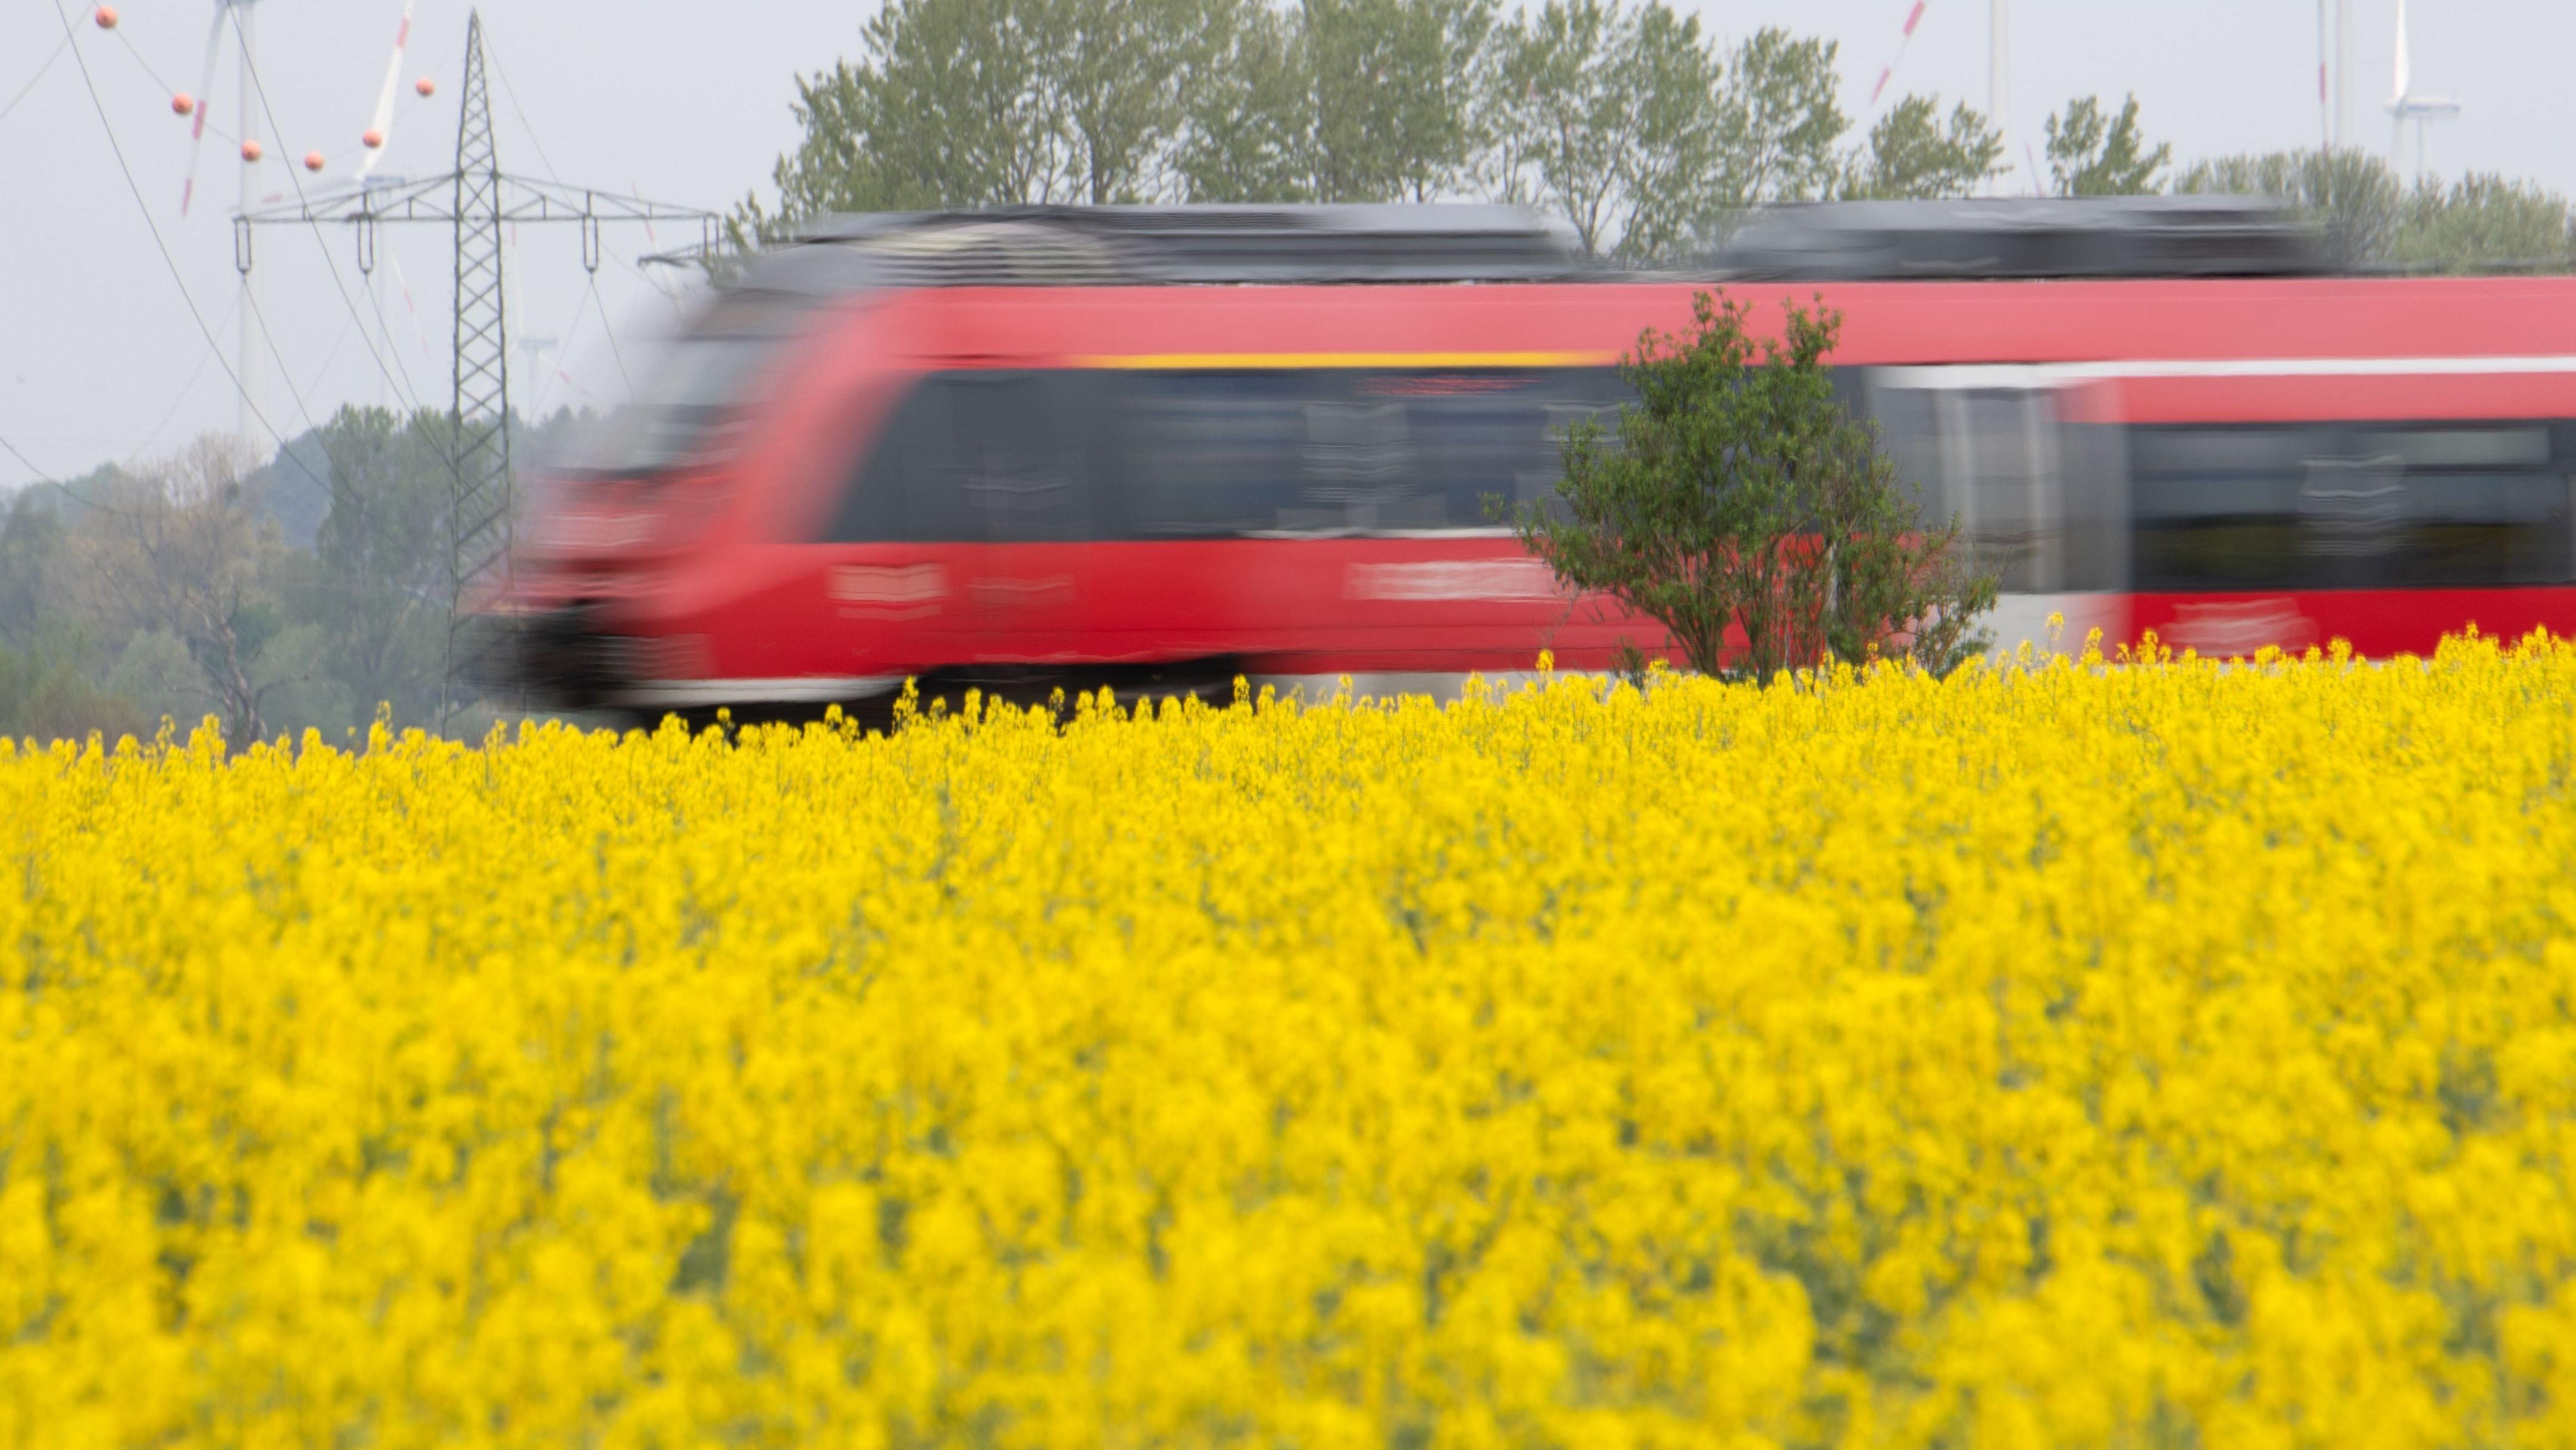 Regionalzug fährt an Rapsfeldern vorbei (Symbolbild)